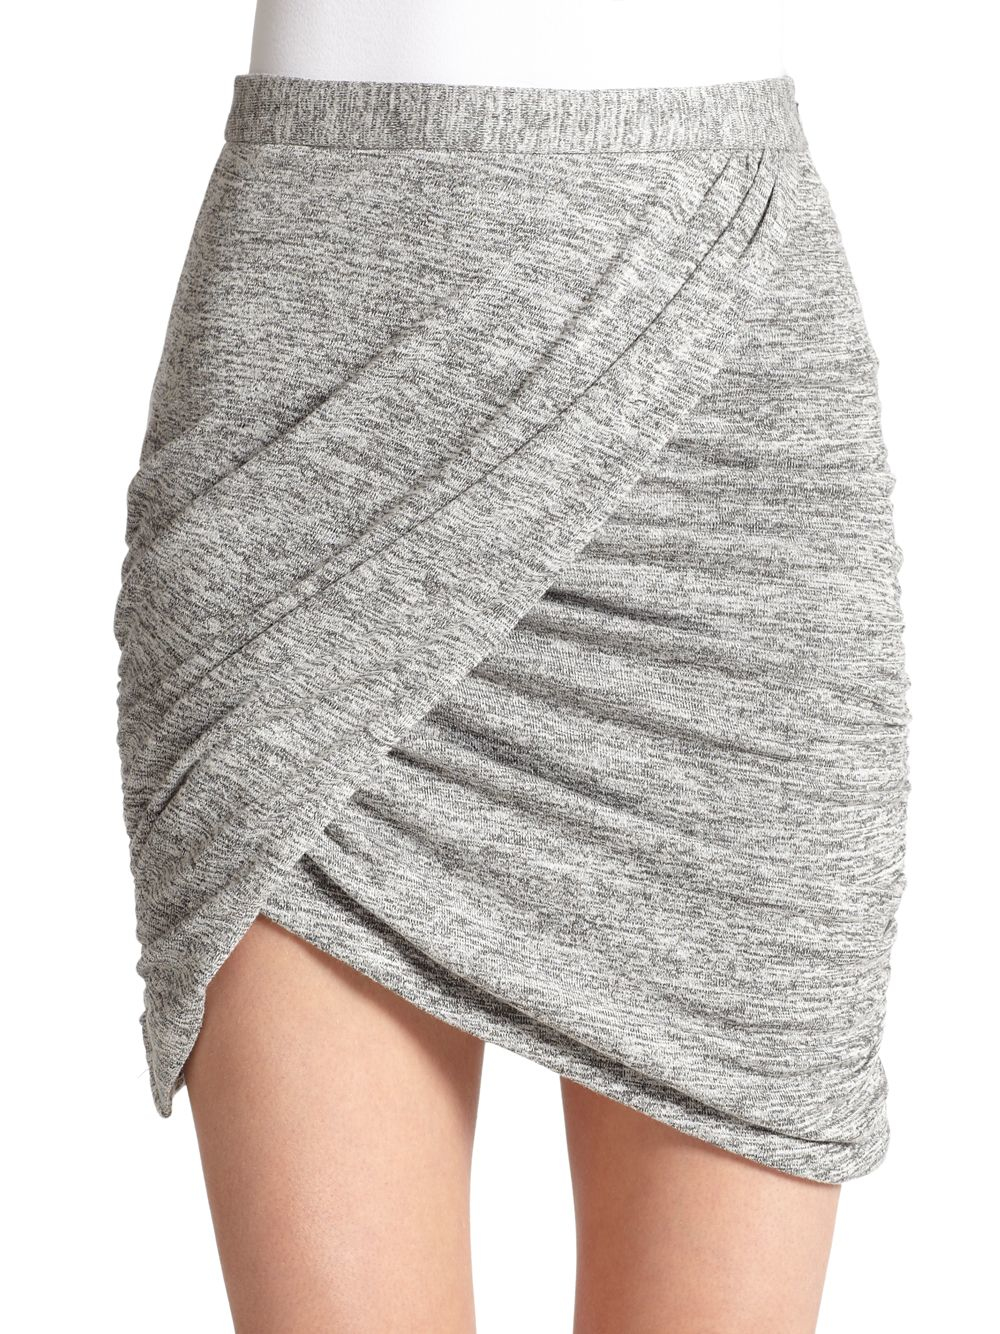 664571bcc1 Elizabeth and James Zayn Ruched Asymmetrical Wrap-effect Skirt in ...